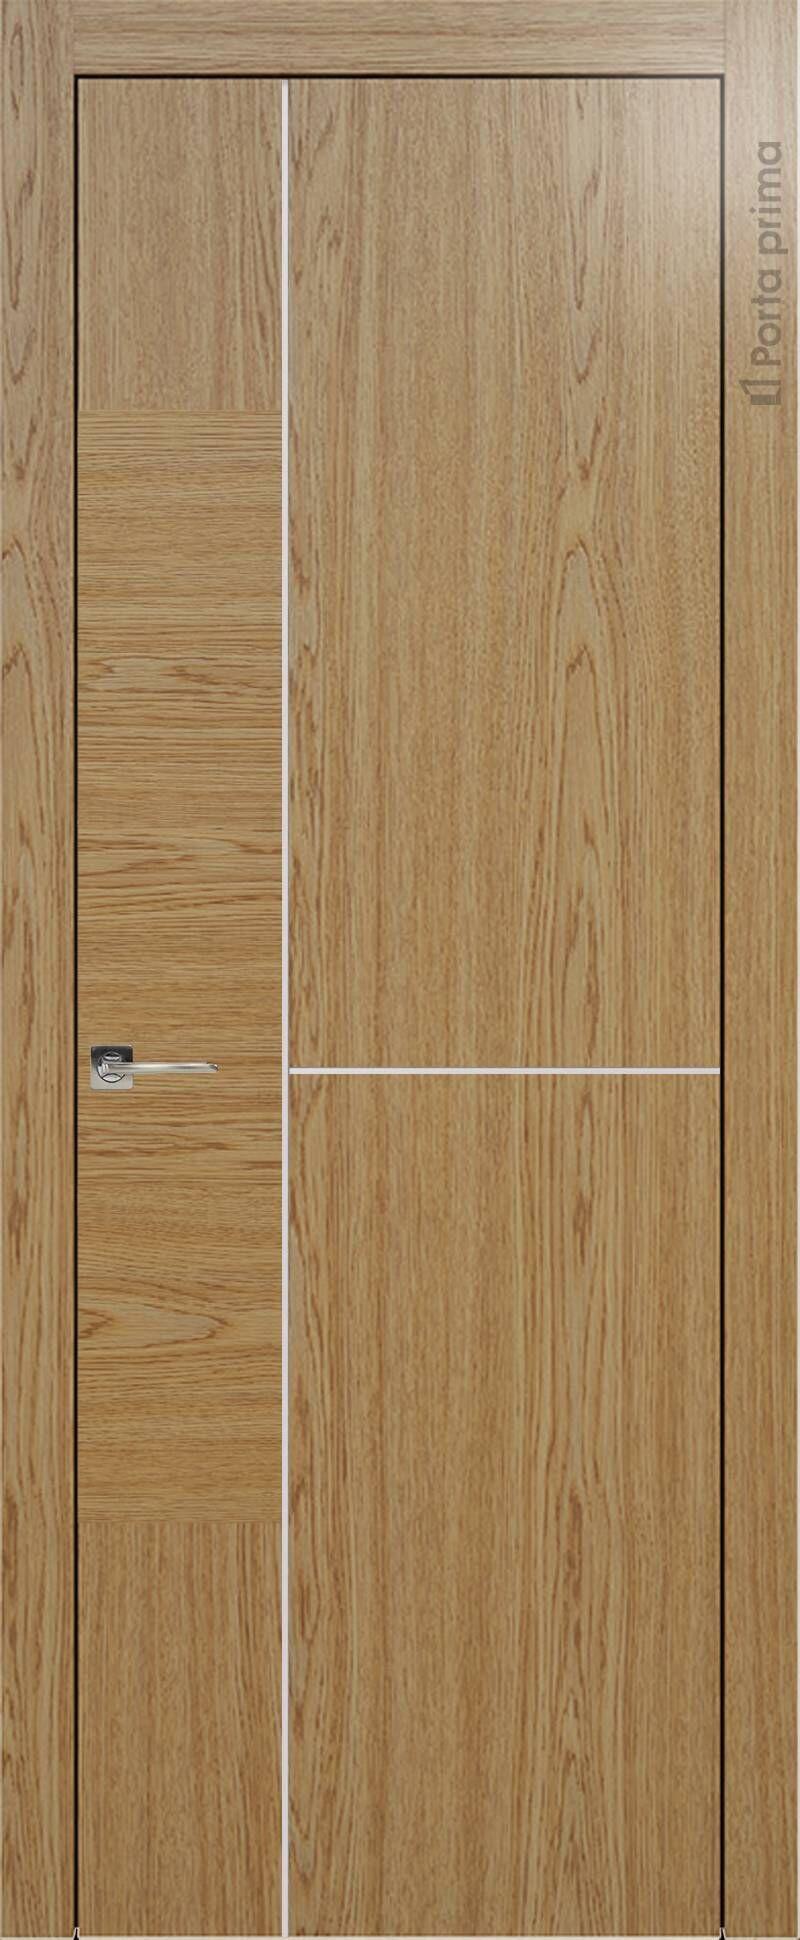 Tivoli Г-1 цвет - Дуб карамель Без стекла (ДГ)